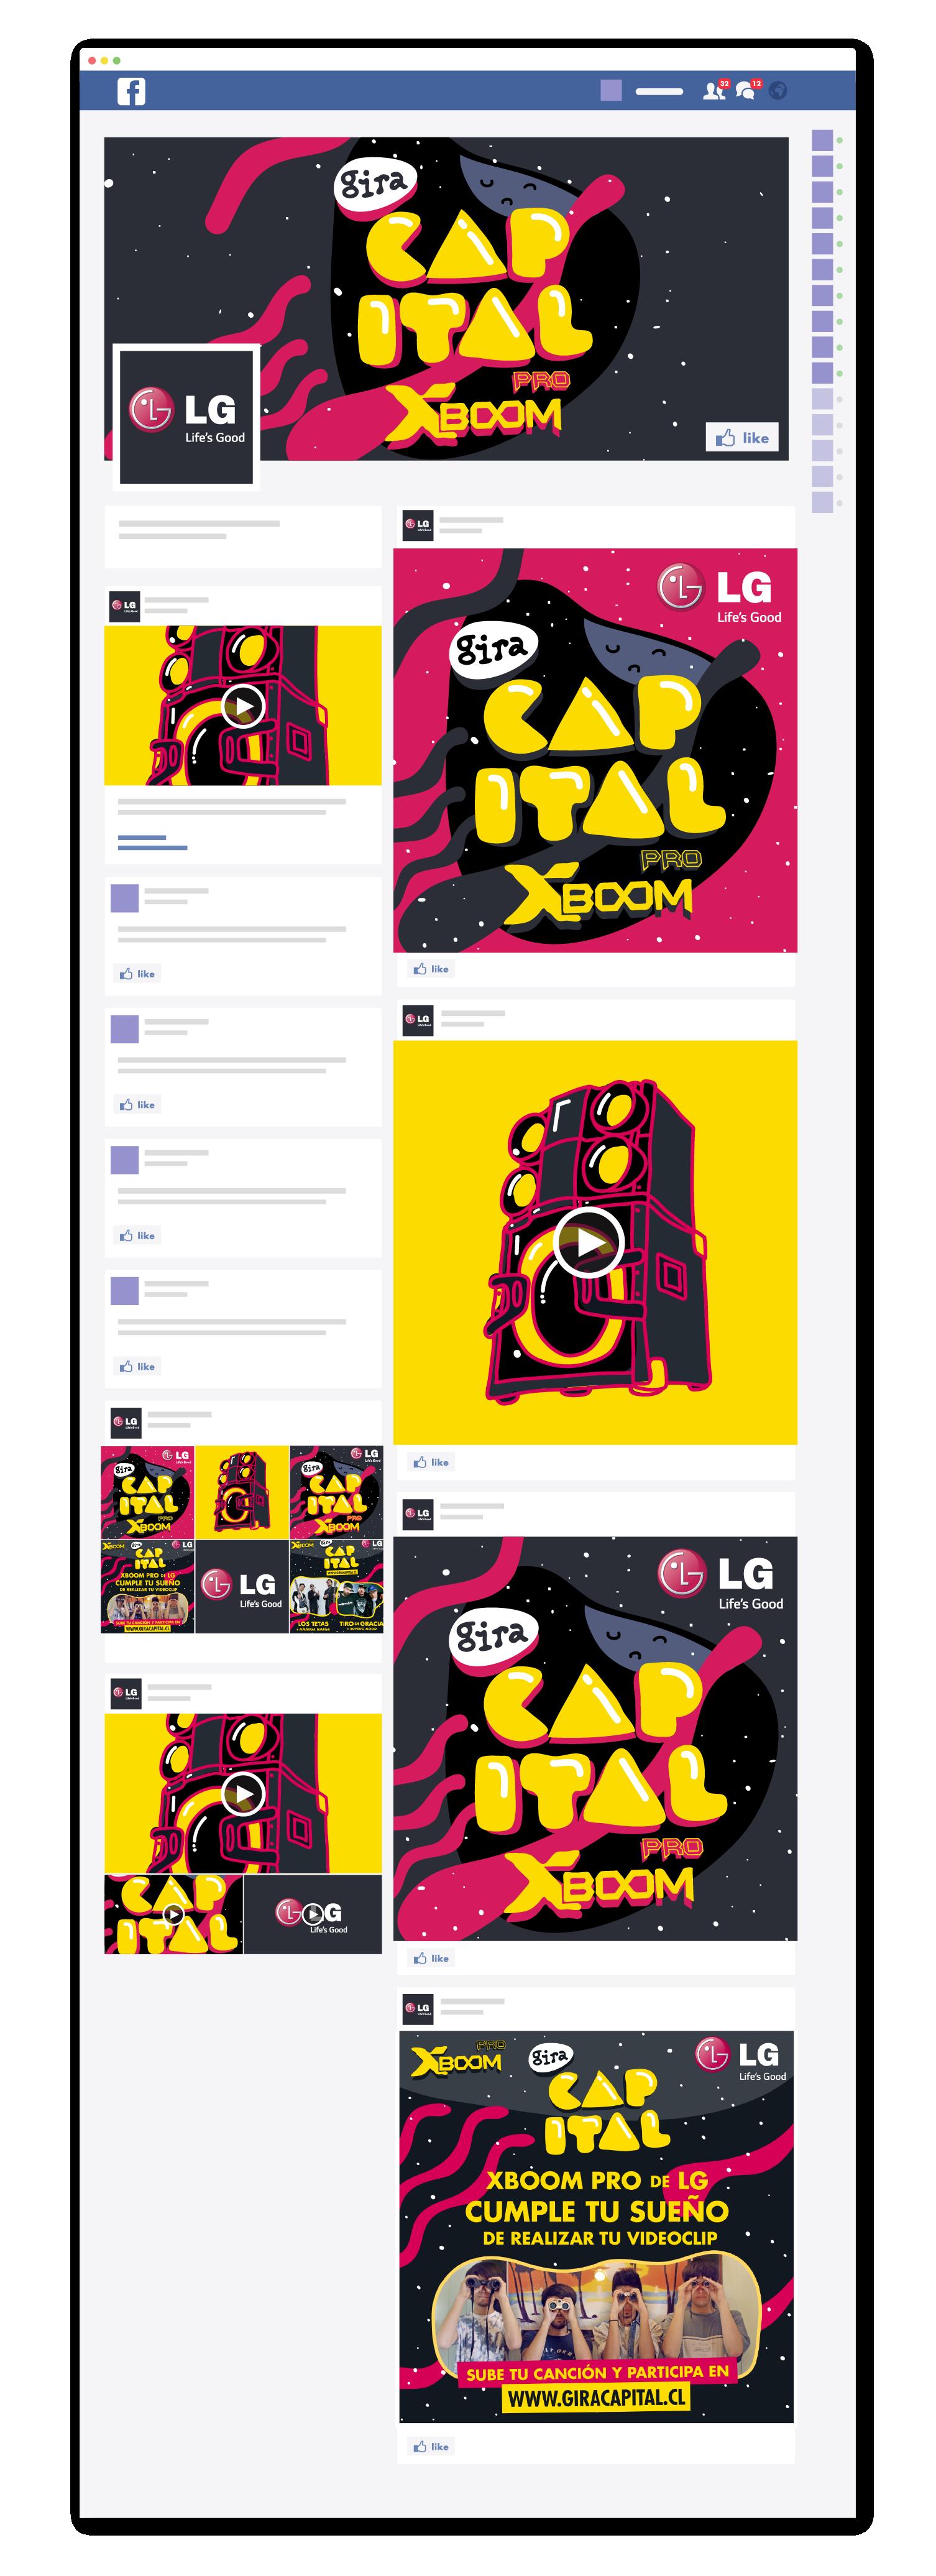 fanpage-LG